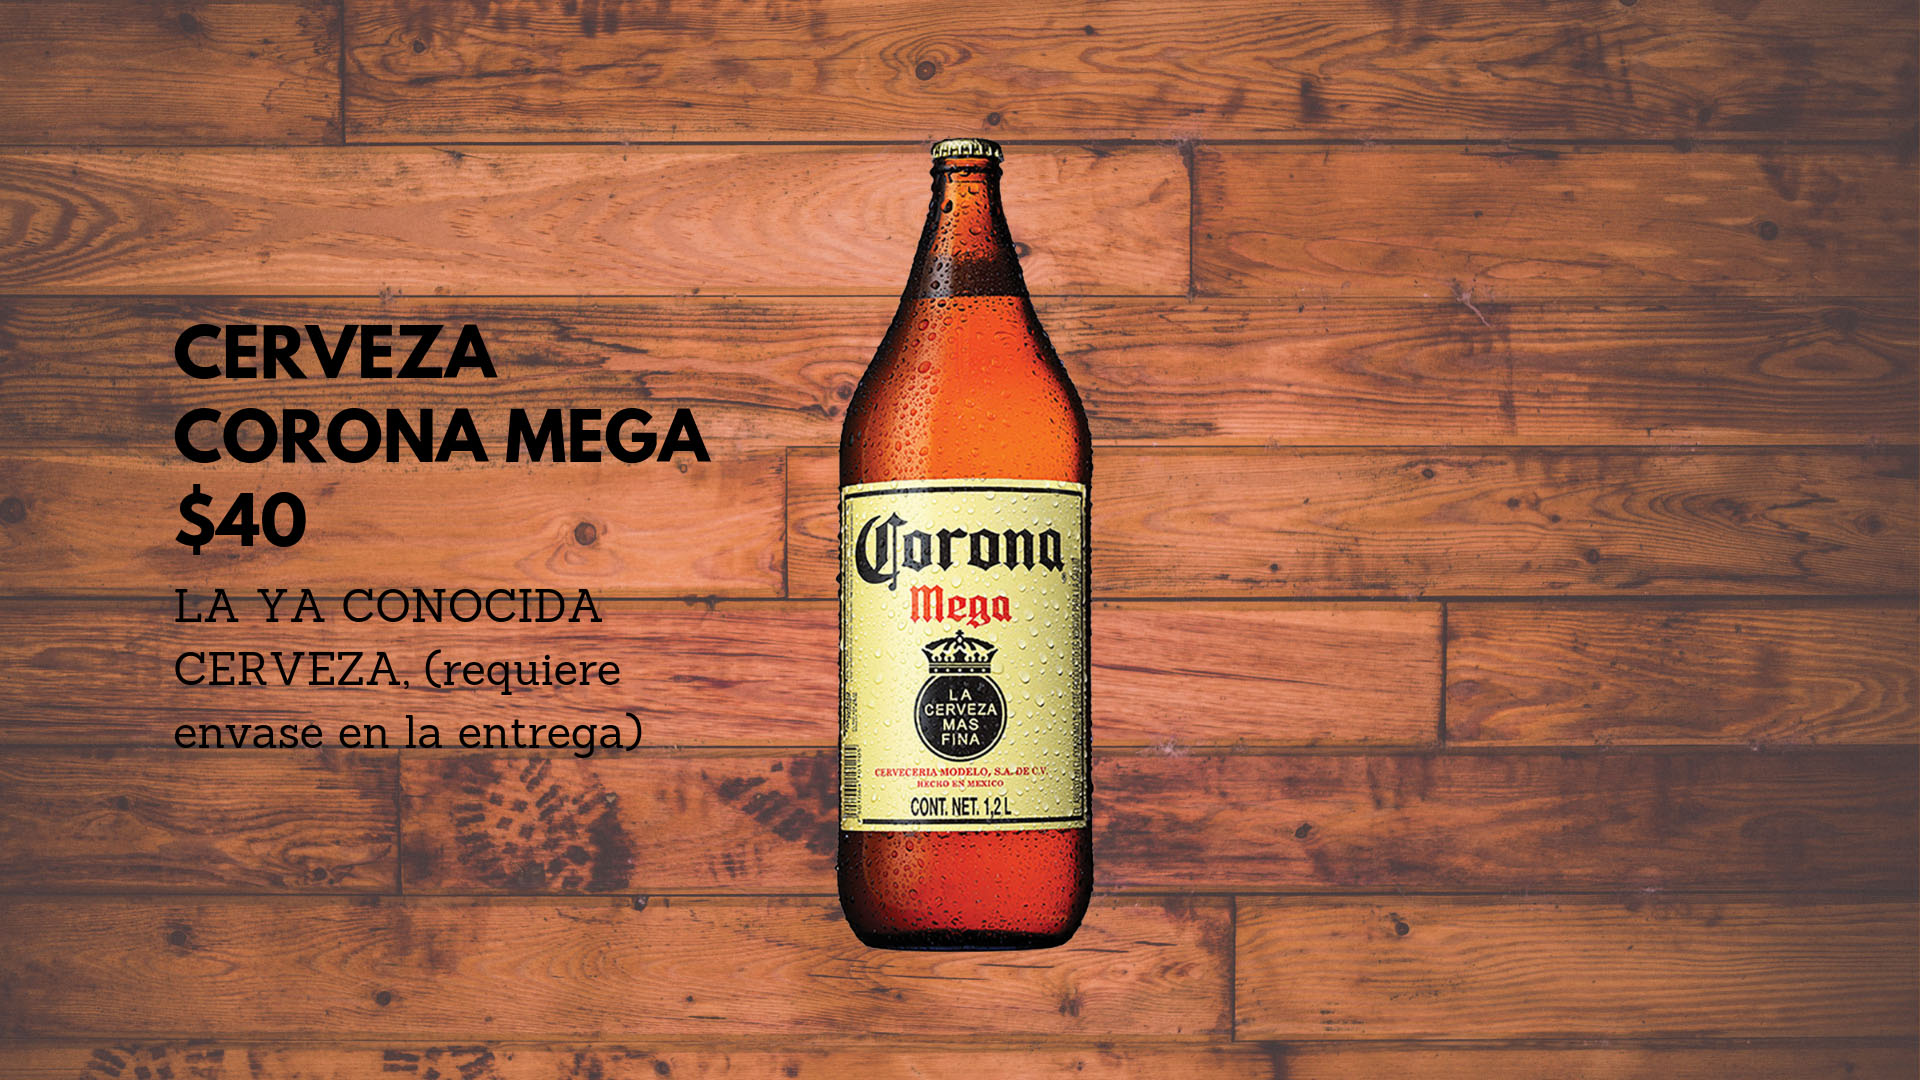 Cerveza Corona Mega